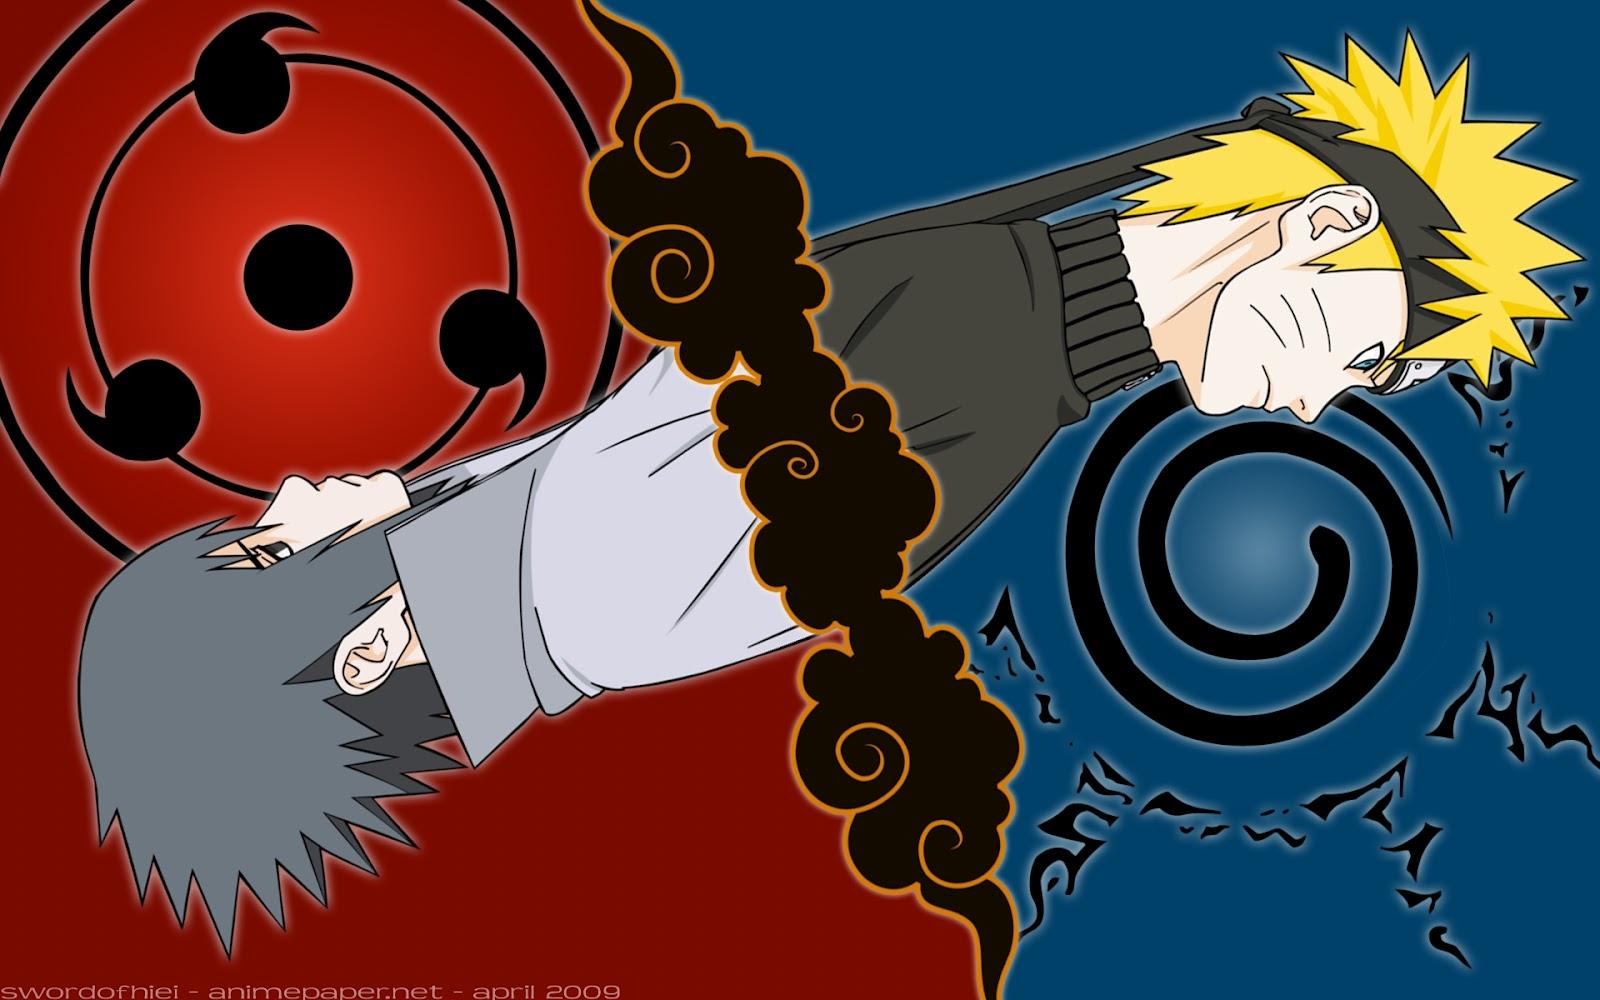 Naruto And Sasuke Wallpaper Hd 4